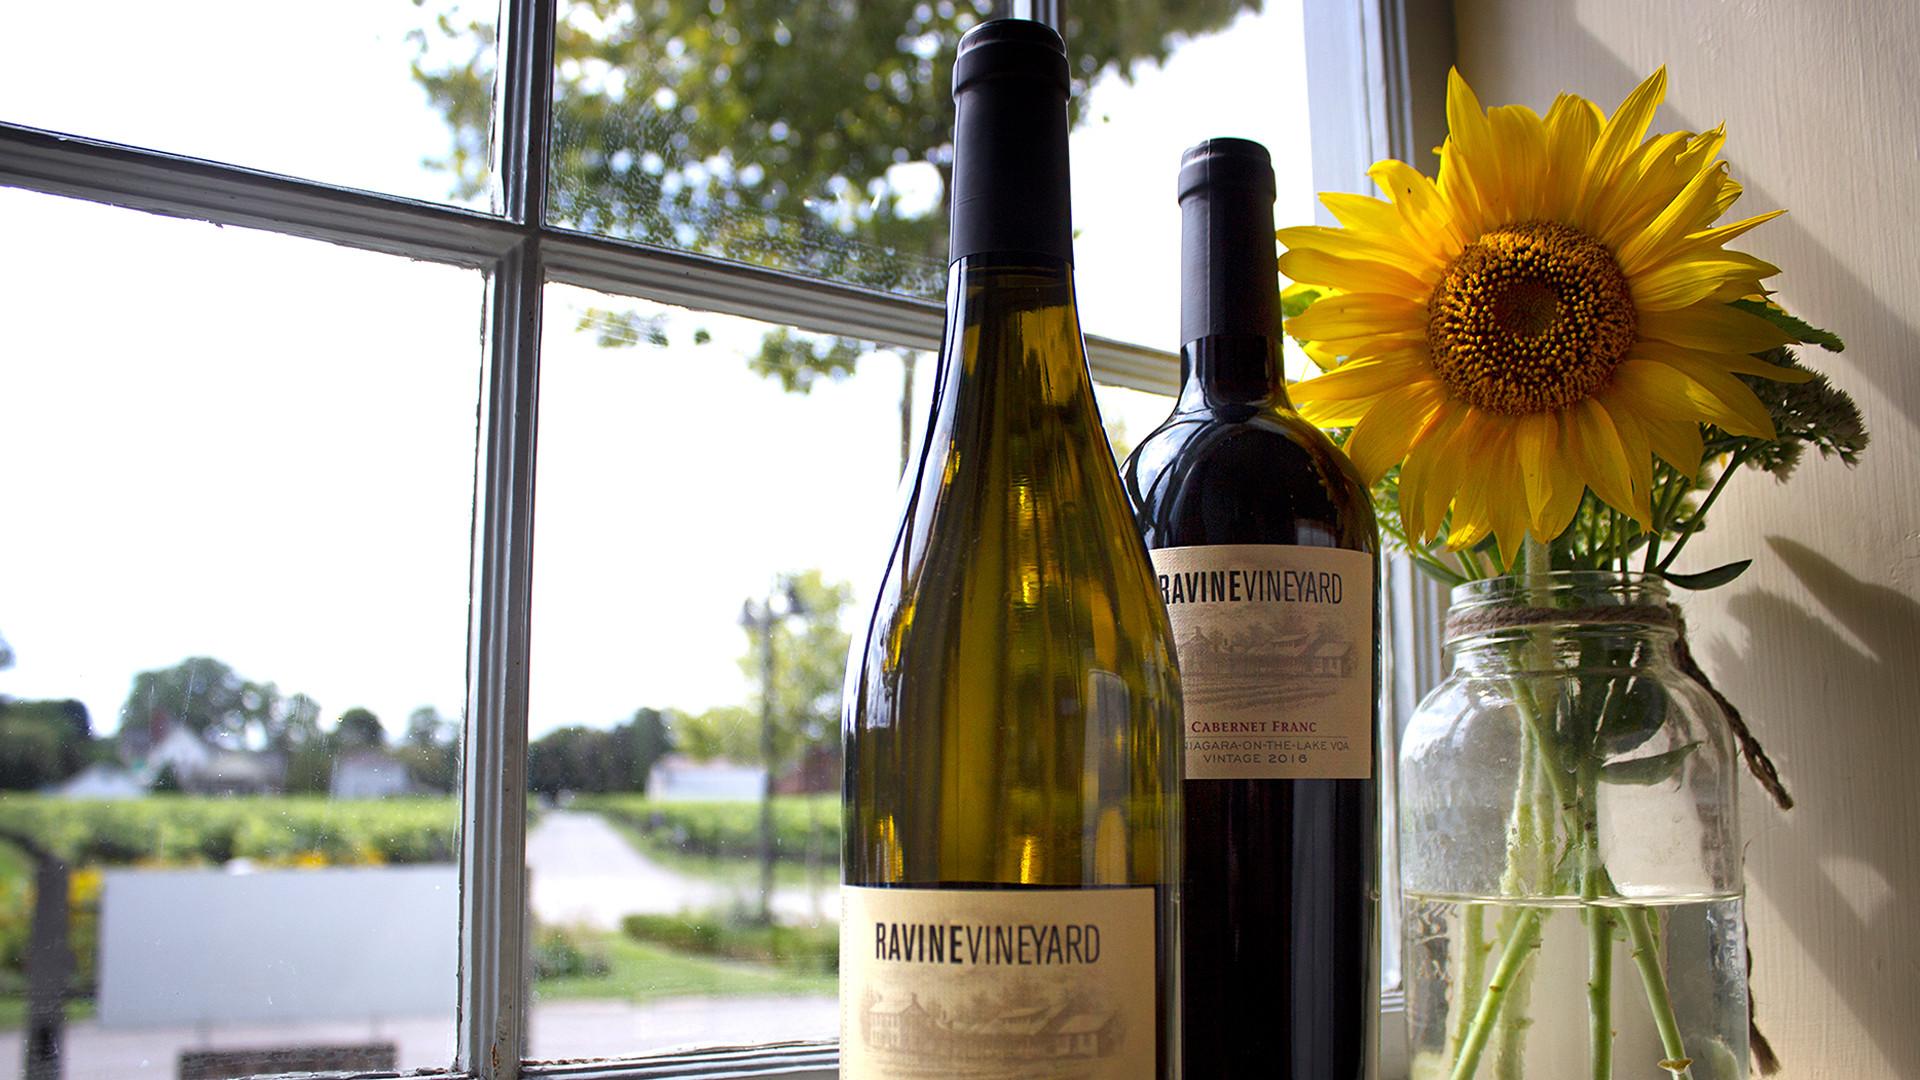 The best wineries in Niagara-on-the-Lake | Wine bottles at Ravine Vineyard Estate Winery